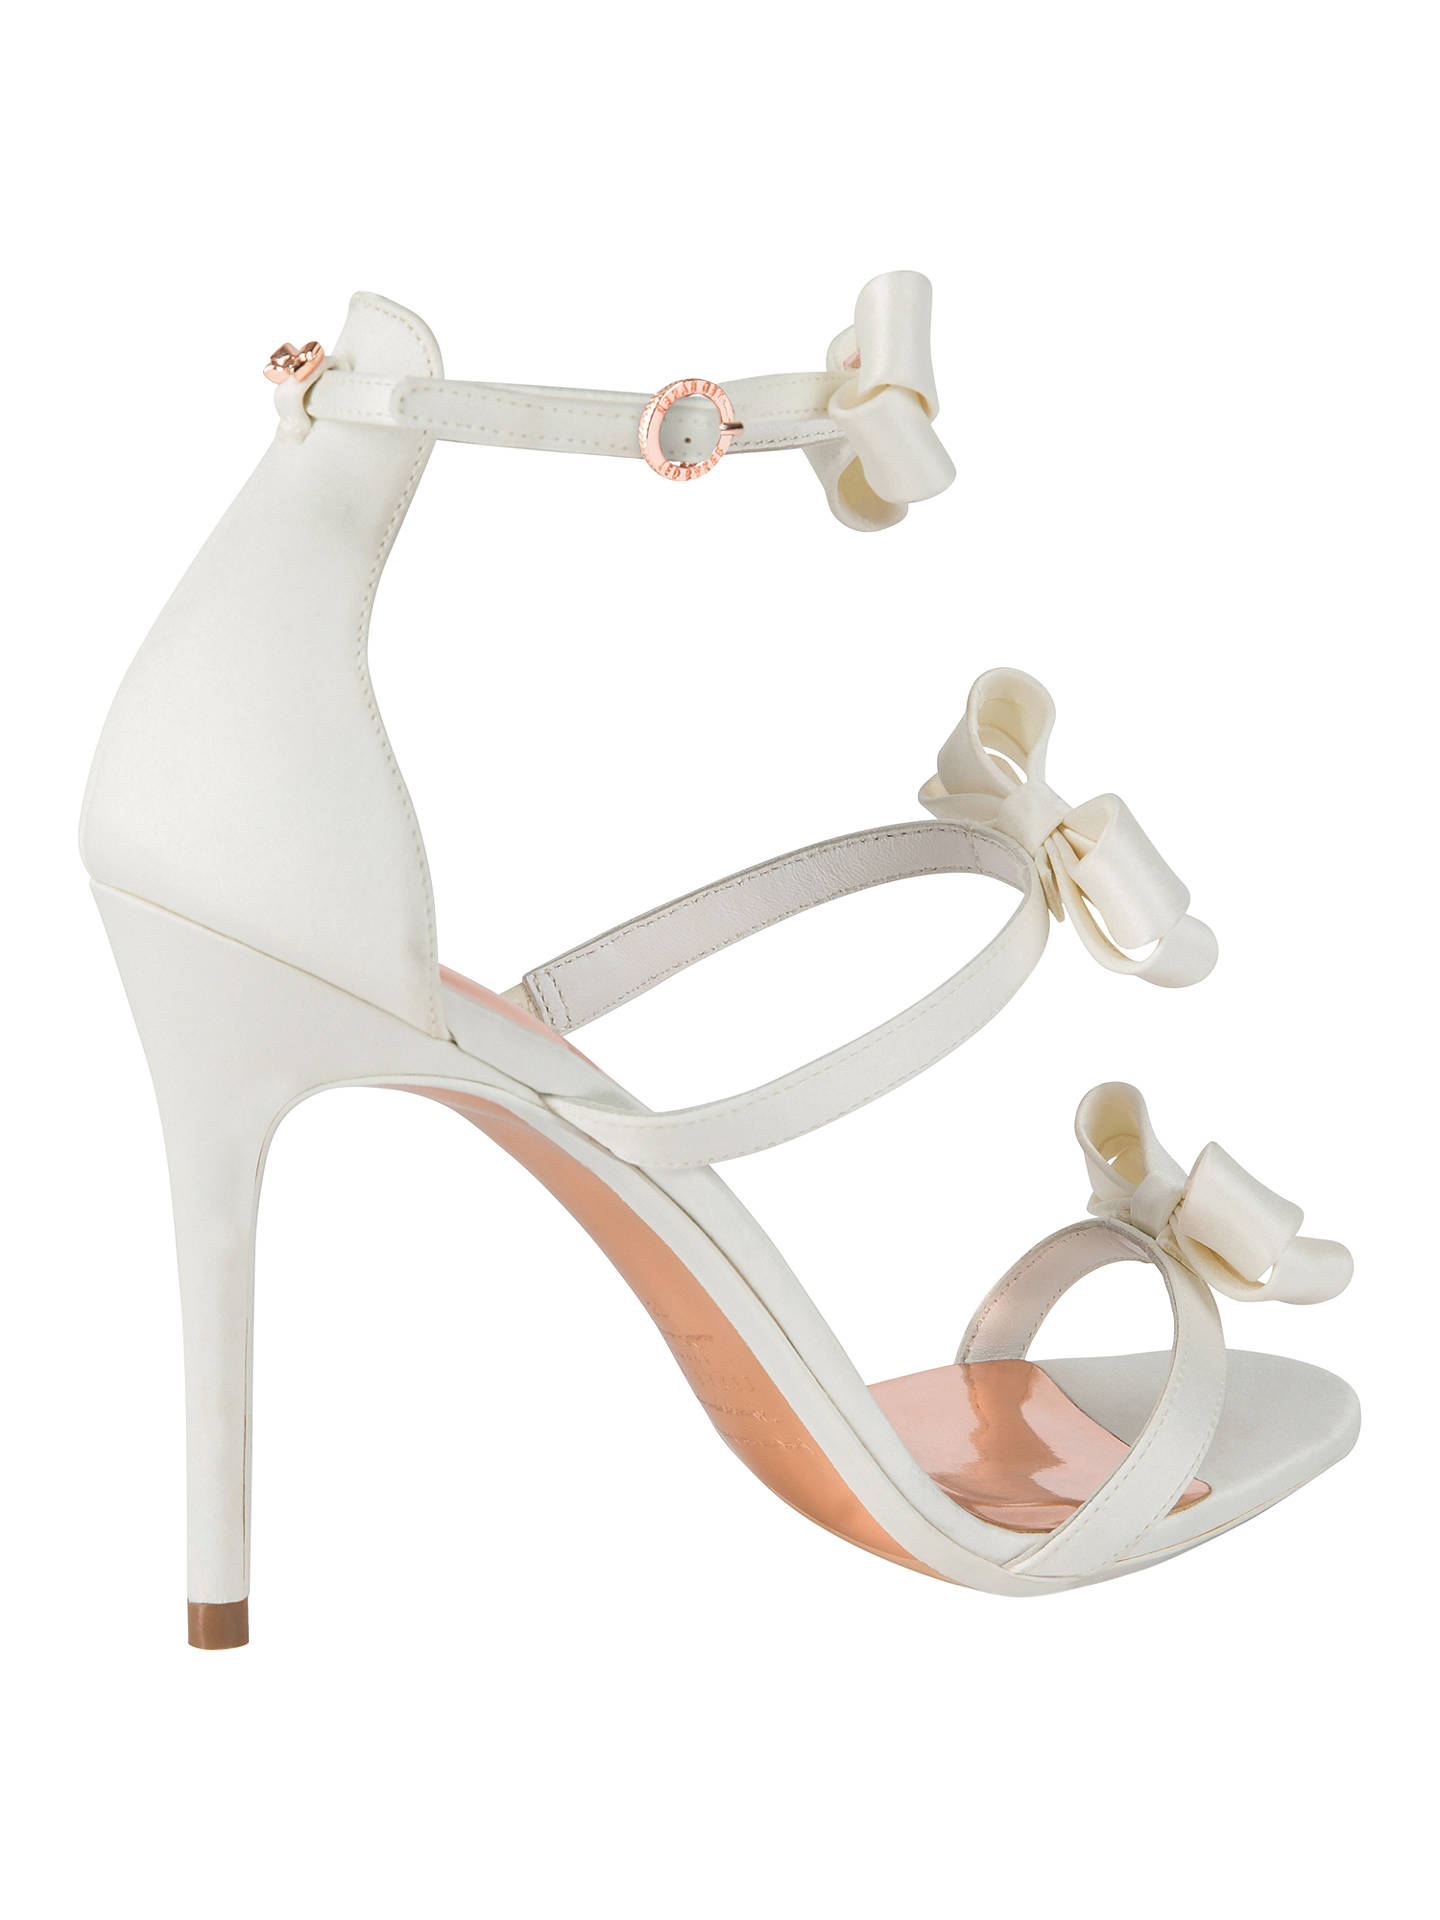 6e1cb495b Buy Ted Baker Nuscala Bow Stiletto Heel Sandals